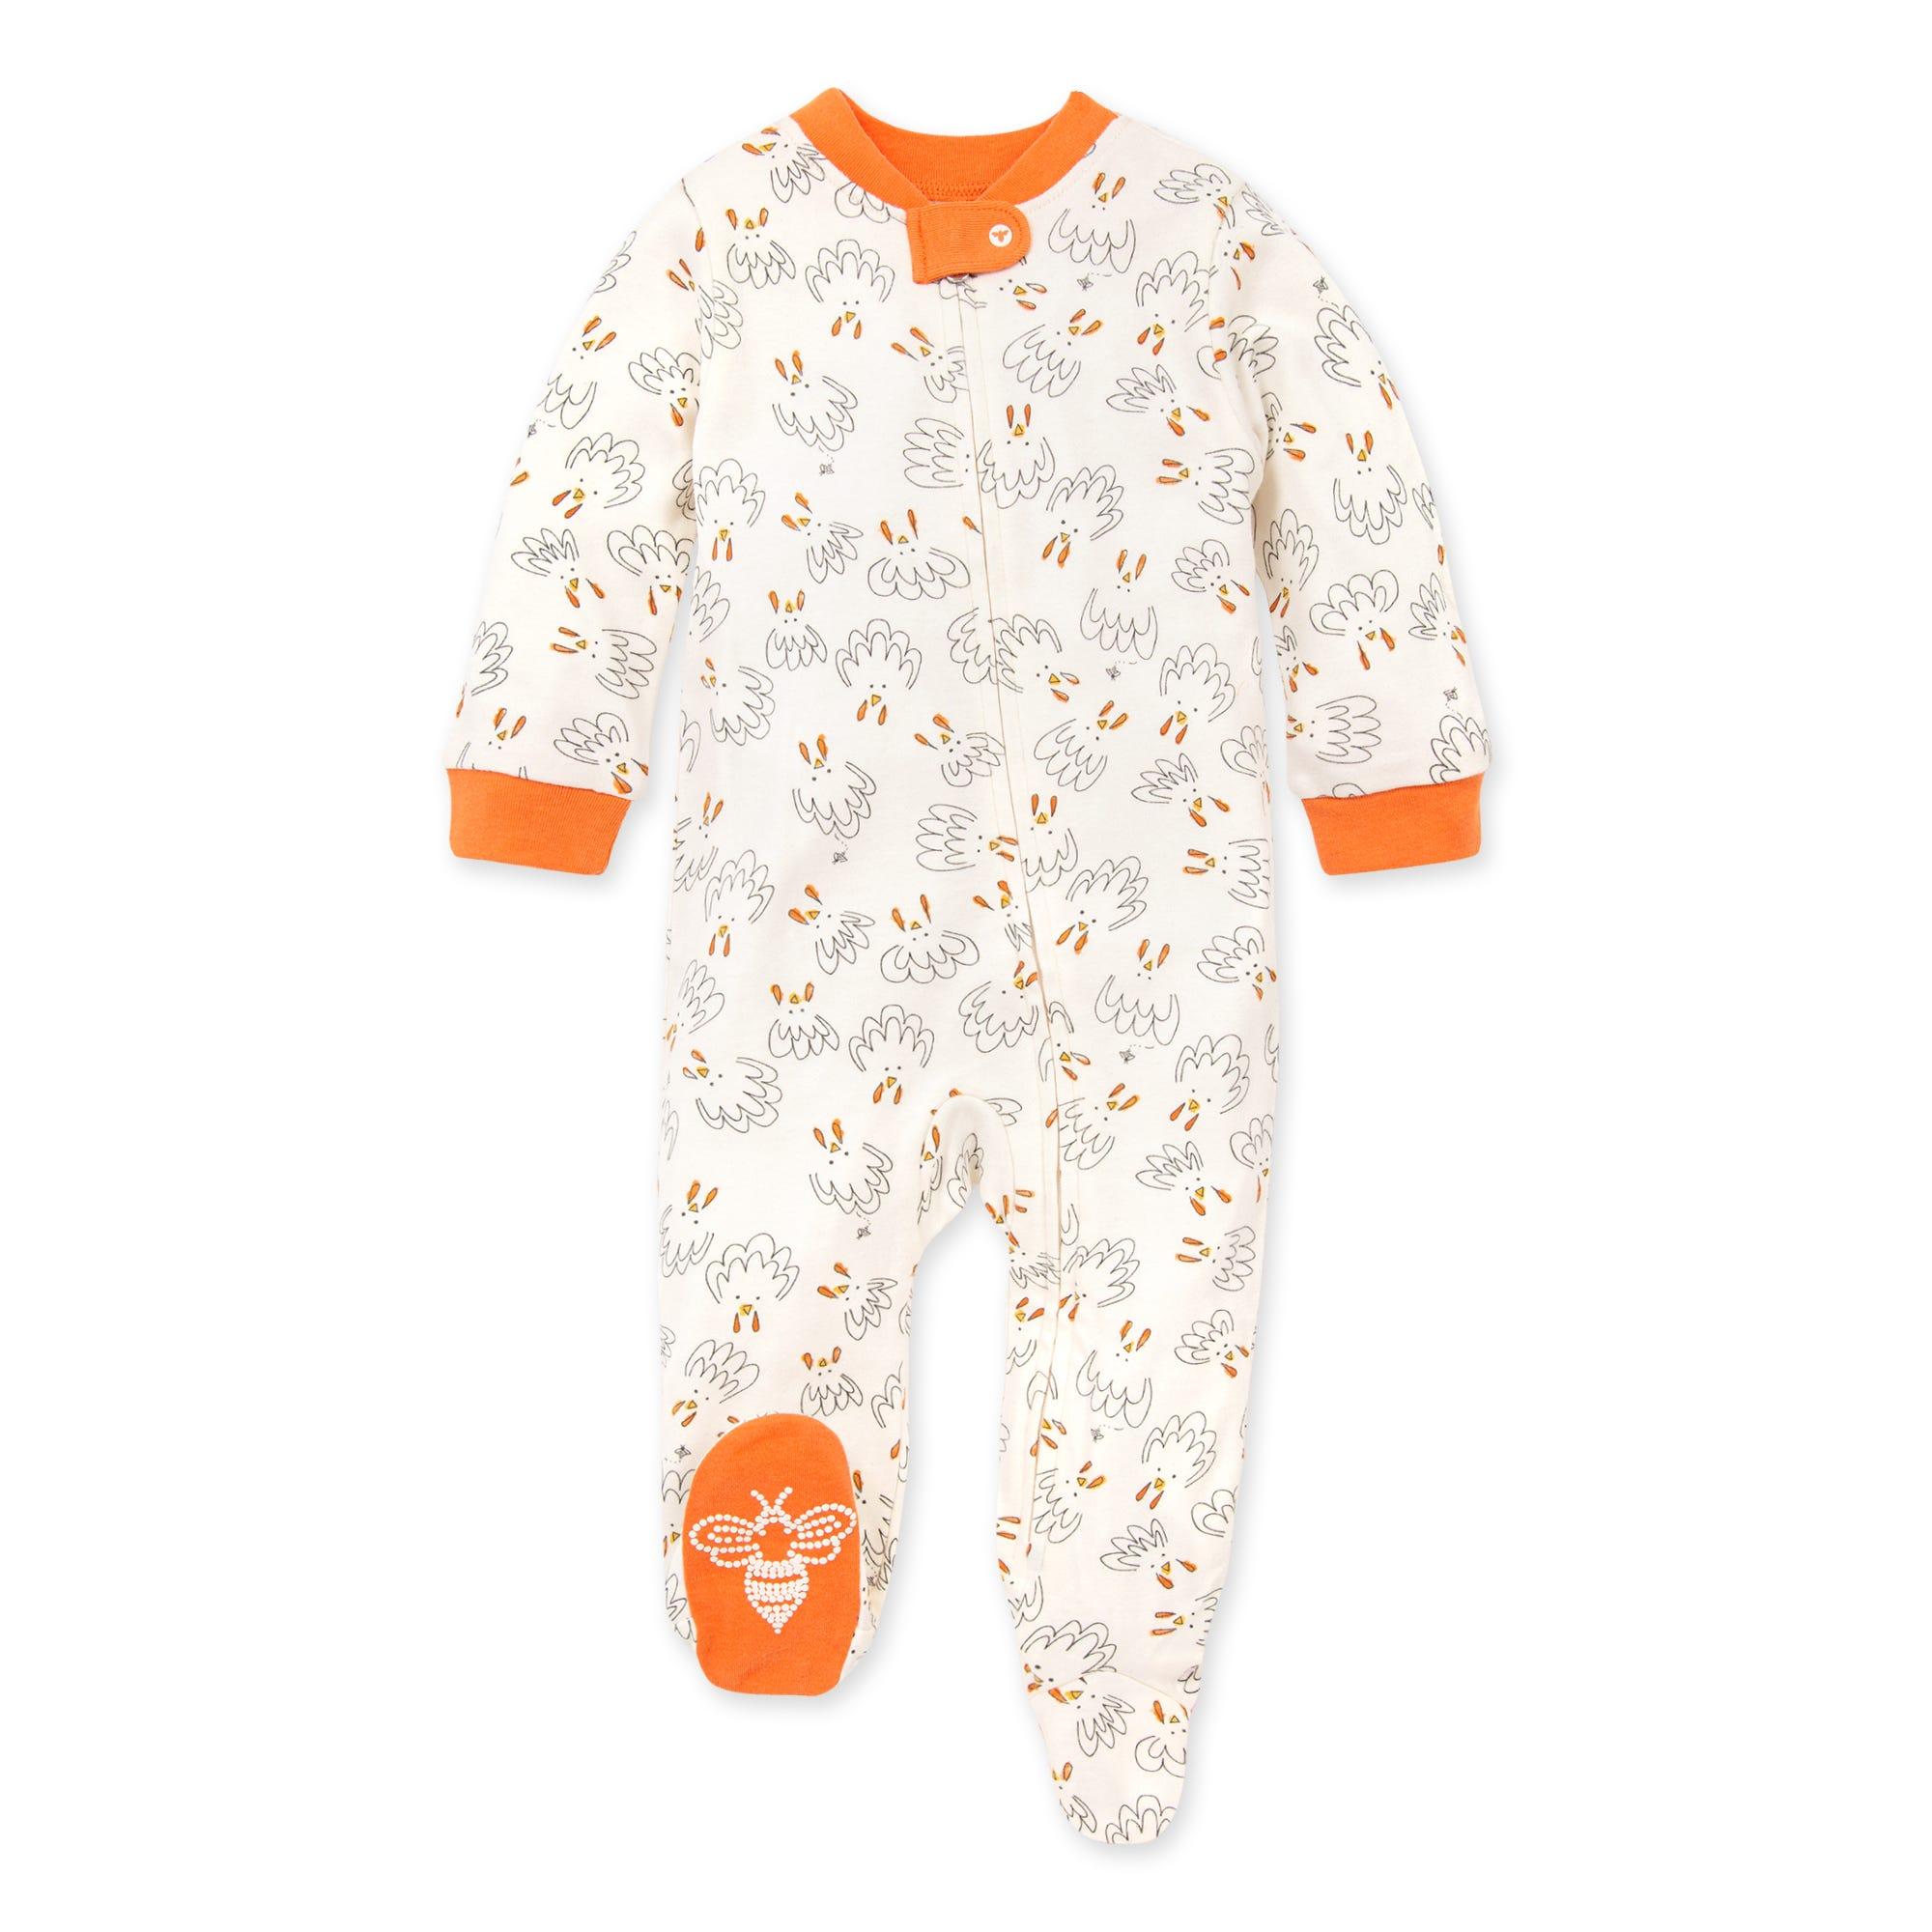 Burts Bees Baby Baby Sleep /& Play Organic Pajamas Botanical Gardens NB-9M One-Piece Zip Up Footed PJ Jumpsuit 3-6 Months